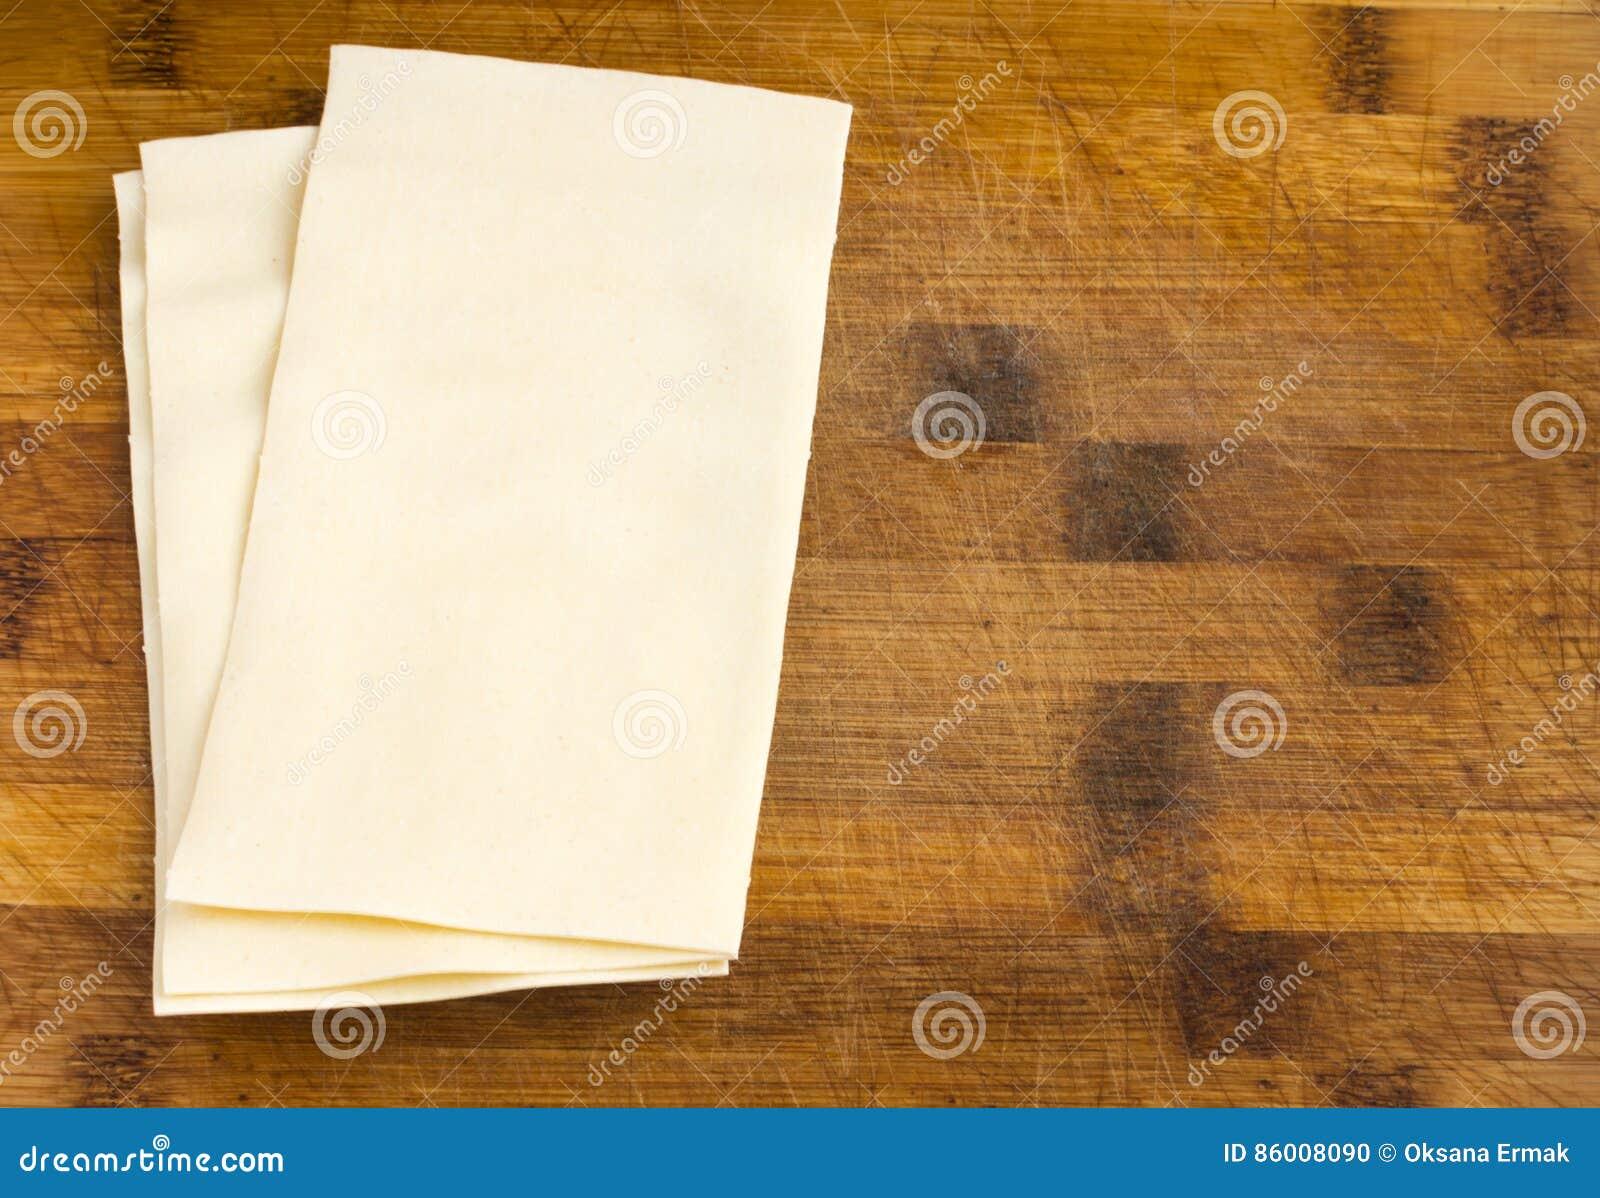 Heap Of Uncooked Lasagna Sheets Or Dry Italian Pasta Stock Photo